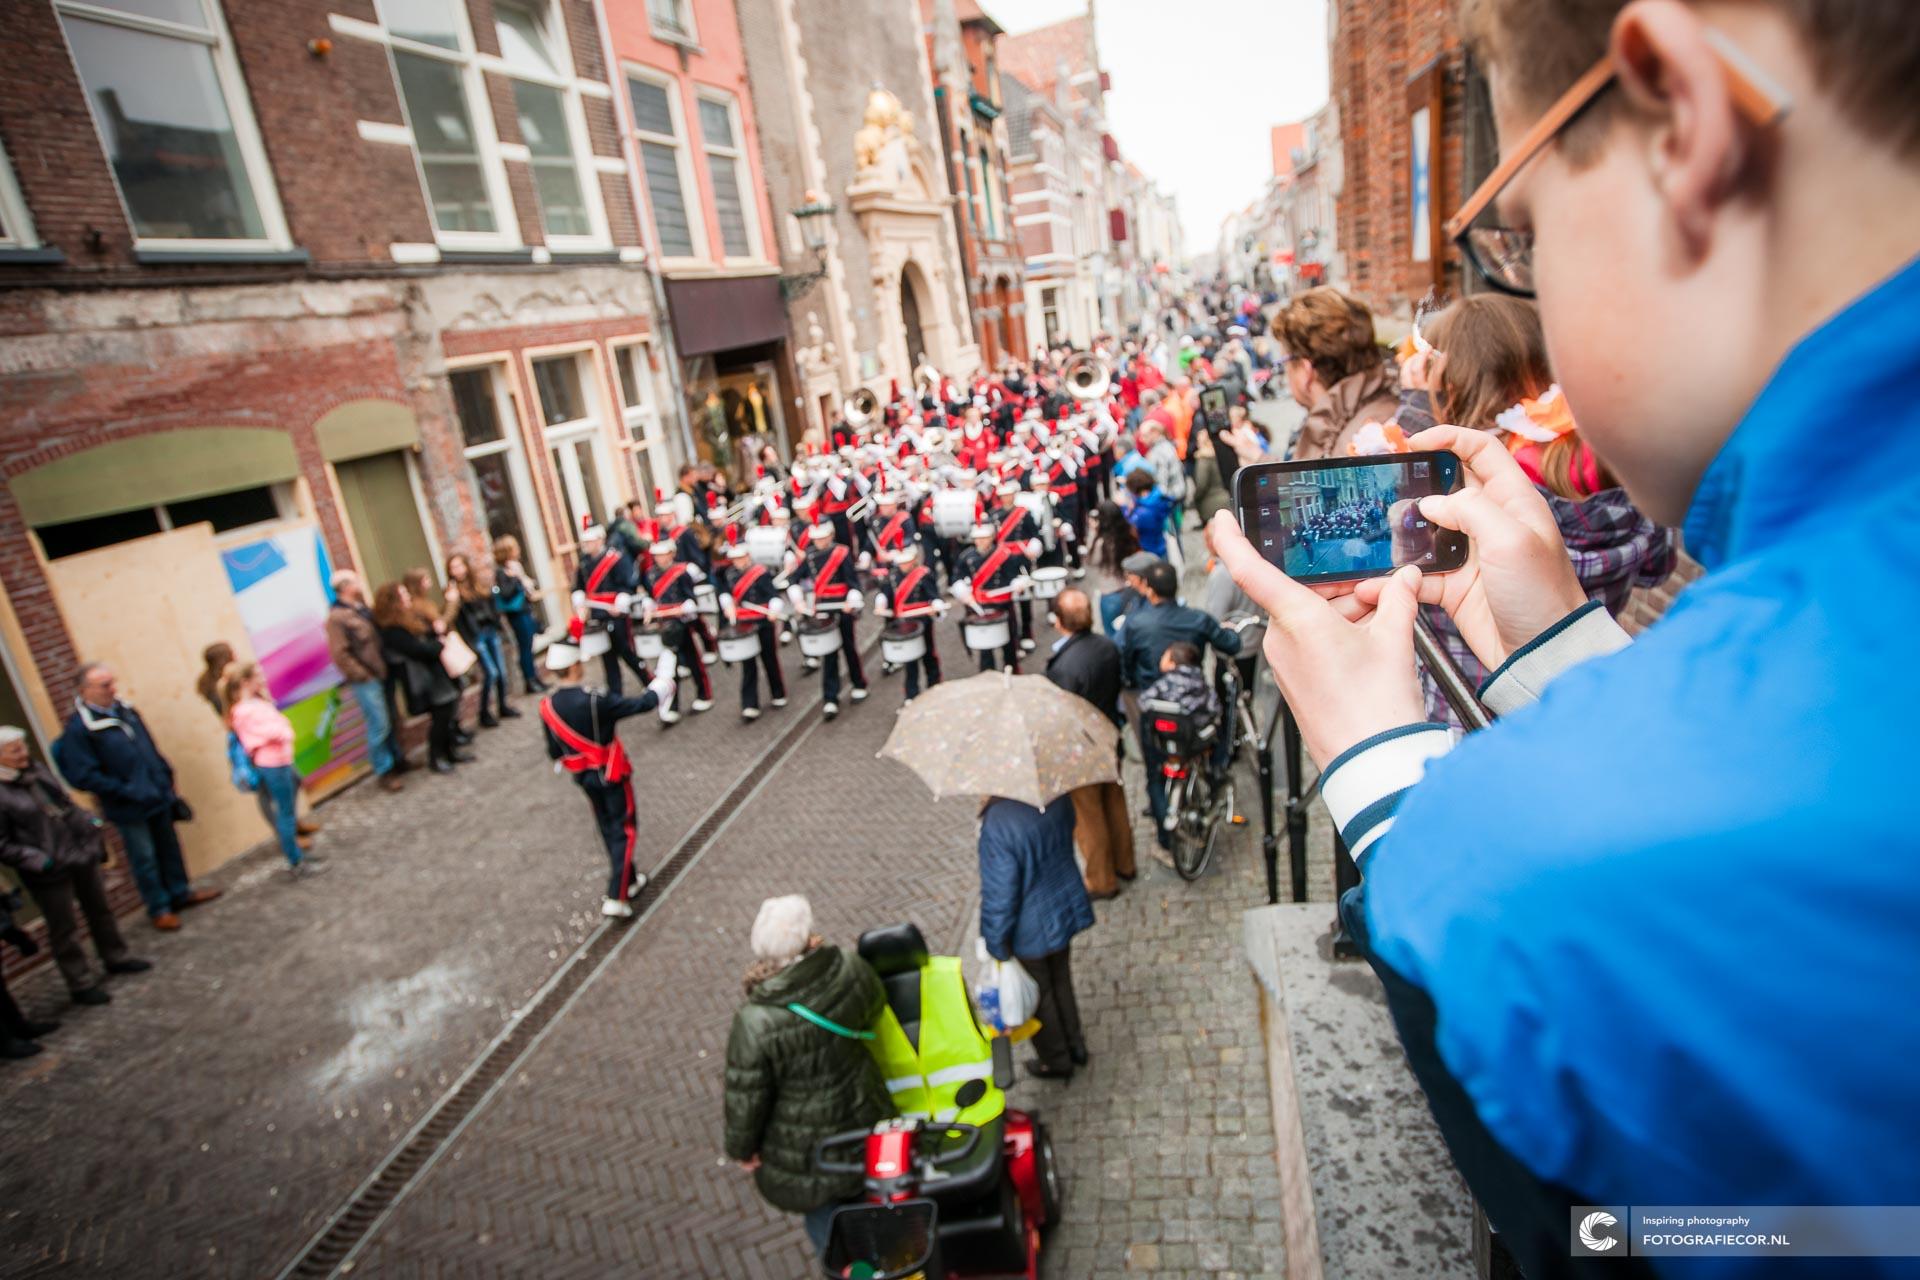 Jong KTK | marchingband | jeugd | parade | fotograaf | © Fotografiecor.nl